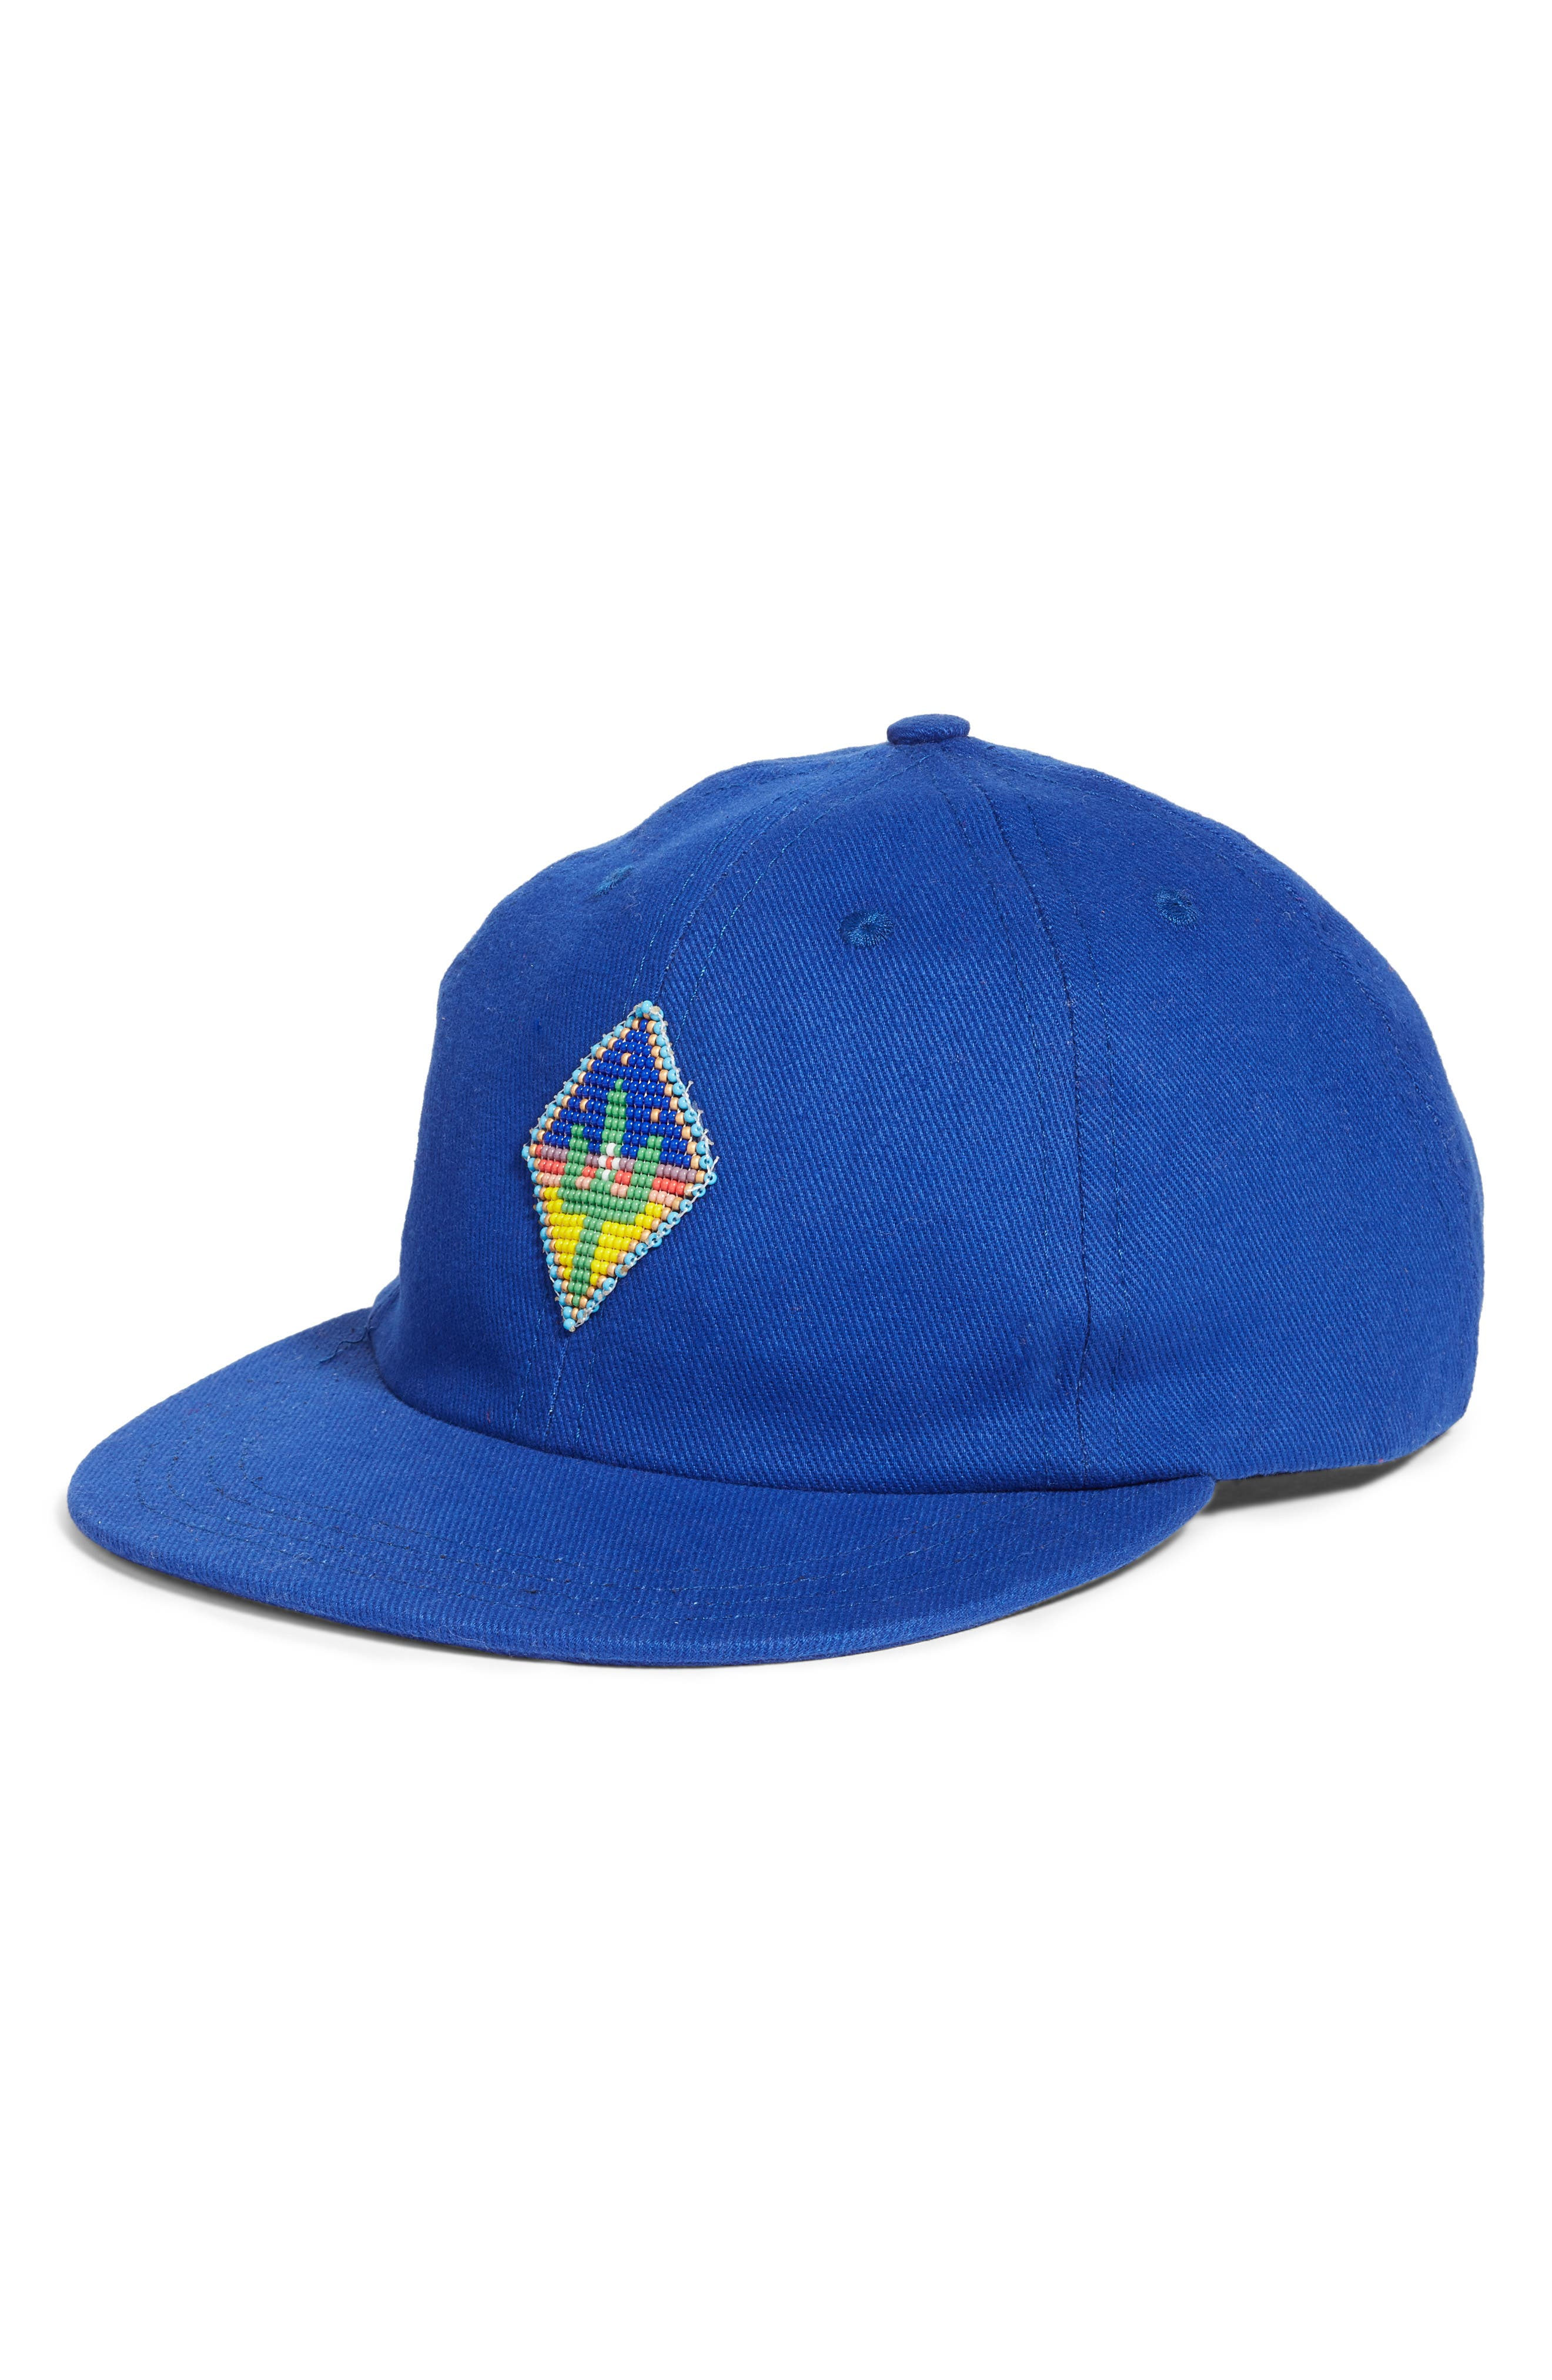 Beaded Cactus Baseball Hat,                             Main thumbnail 1, color,                             BLUE